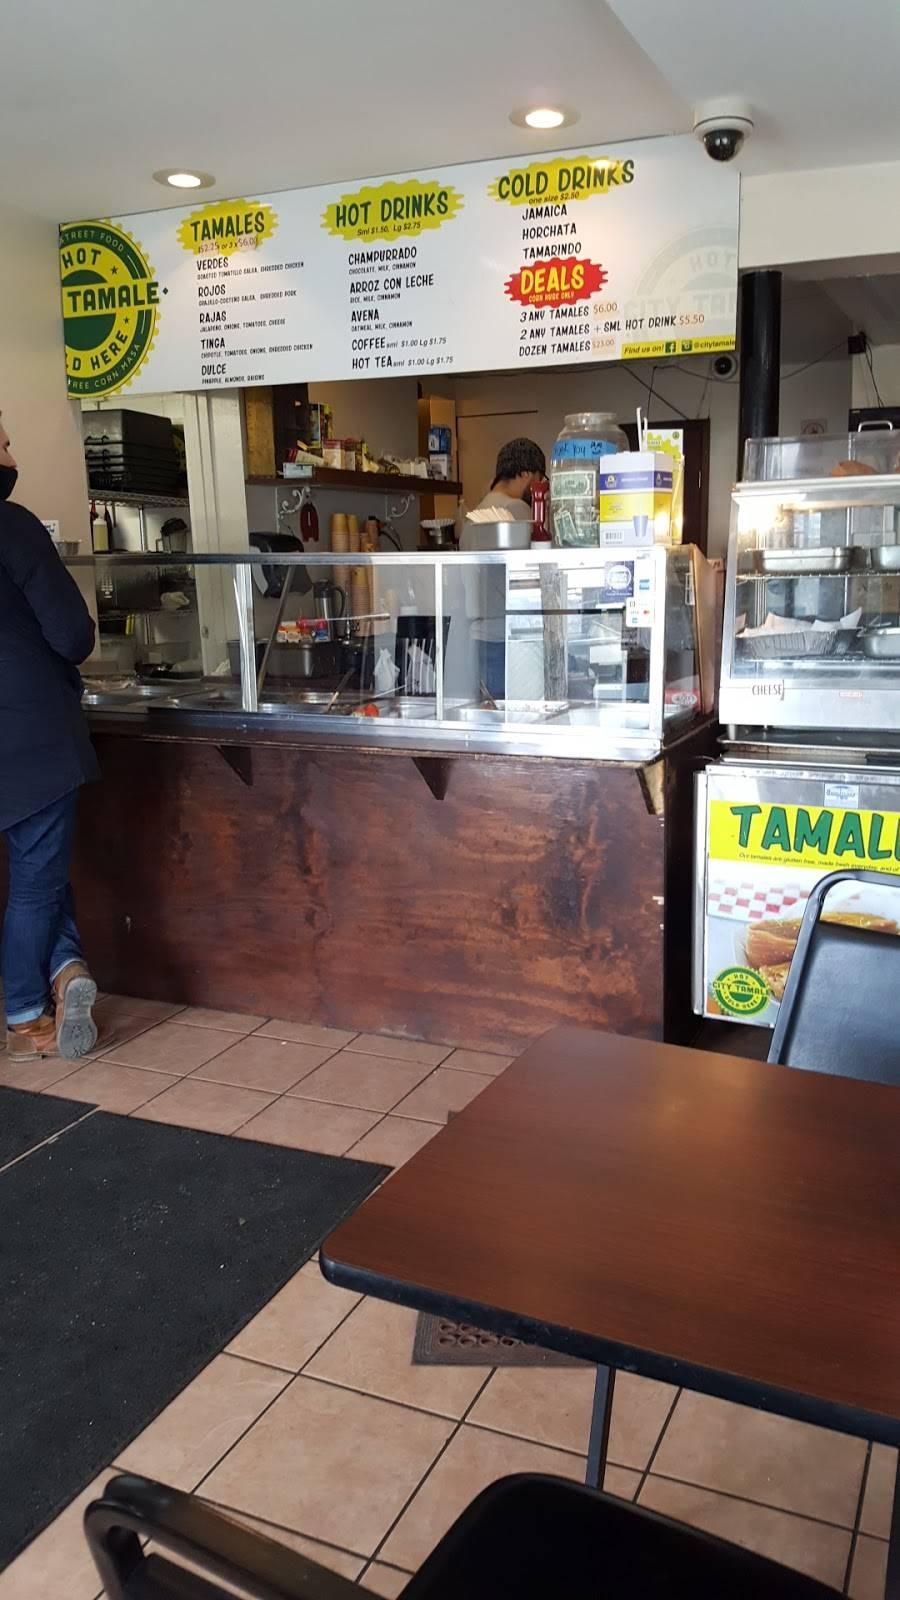 City Tamale | restaurant | 1316 Oak Point Ave, Bronx, NY 10474, USA | 7189911606 OR +1 718-991-1606